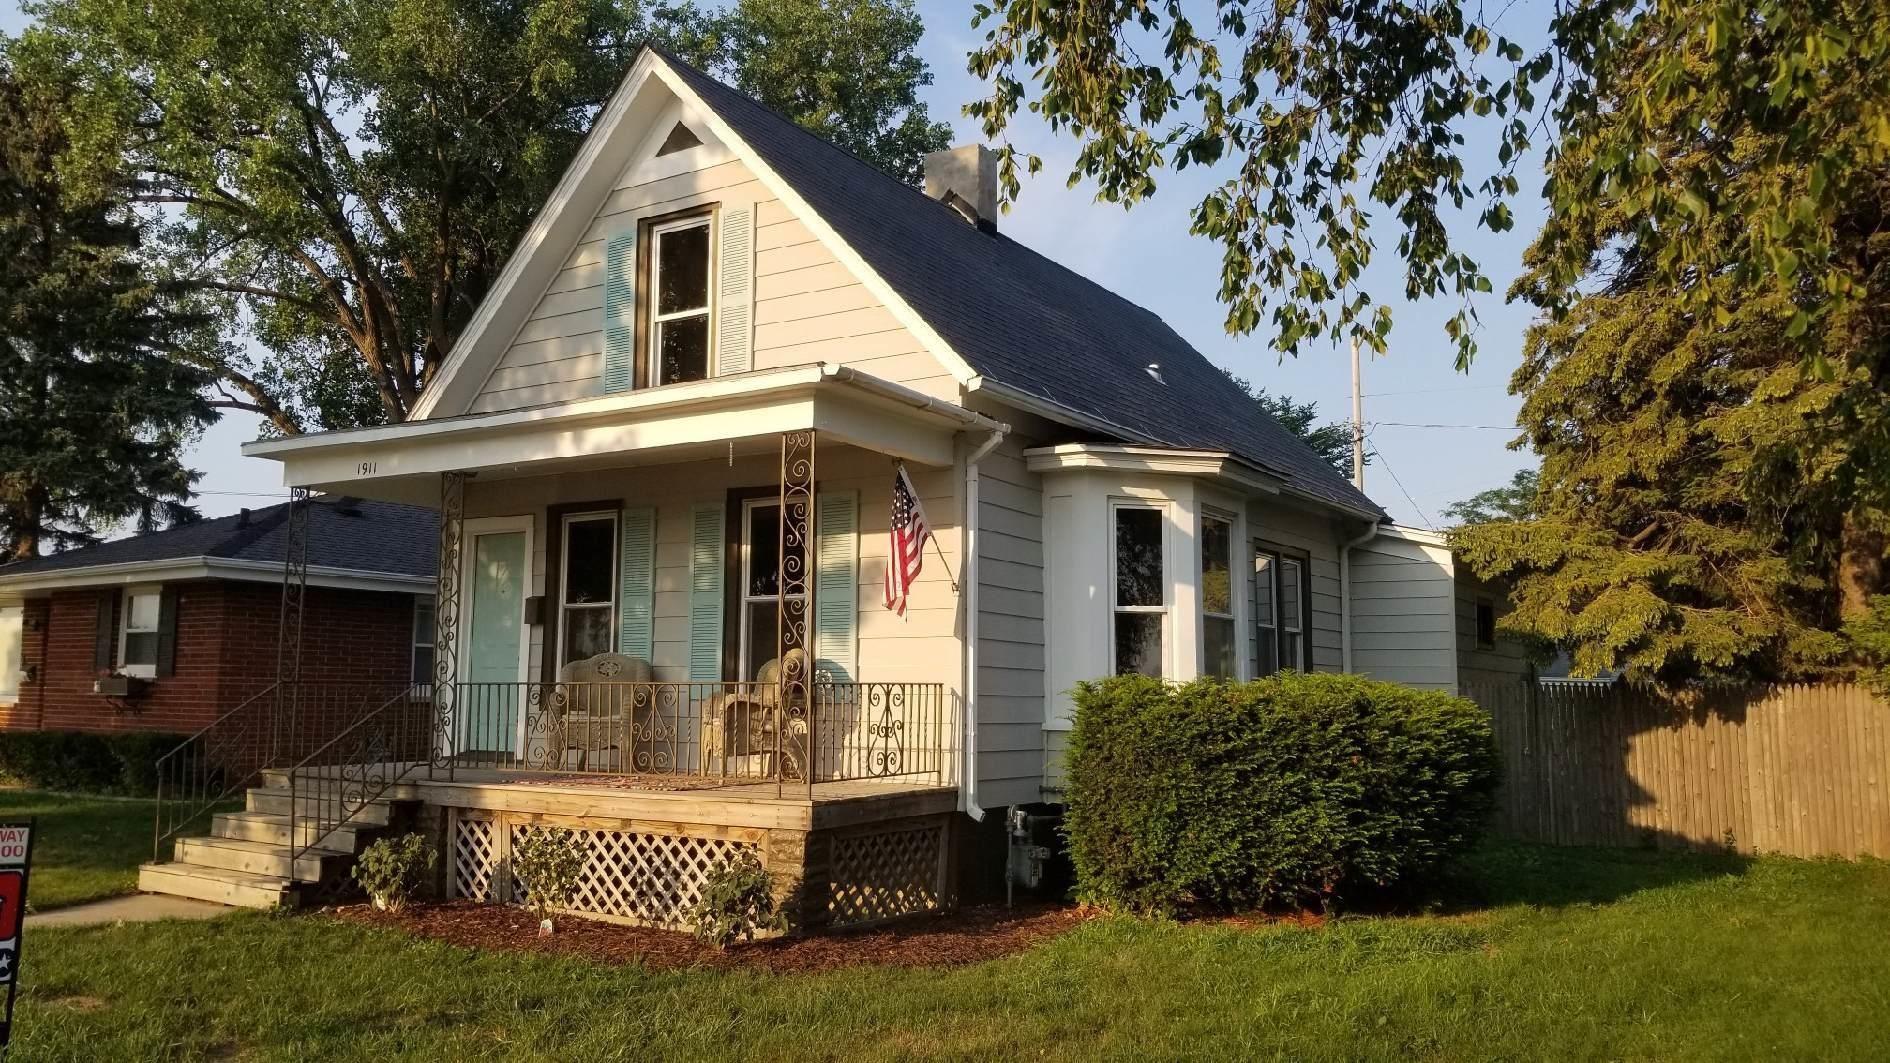 1911 West Blvd, Racine, WI 53403 - #: 1754346